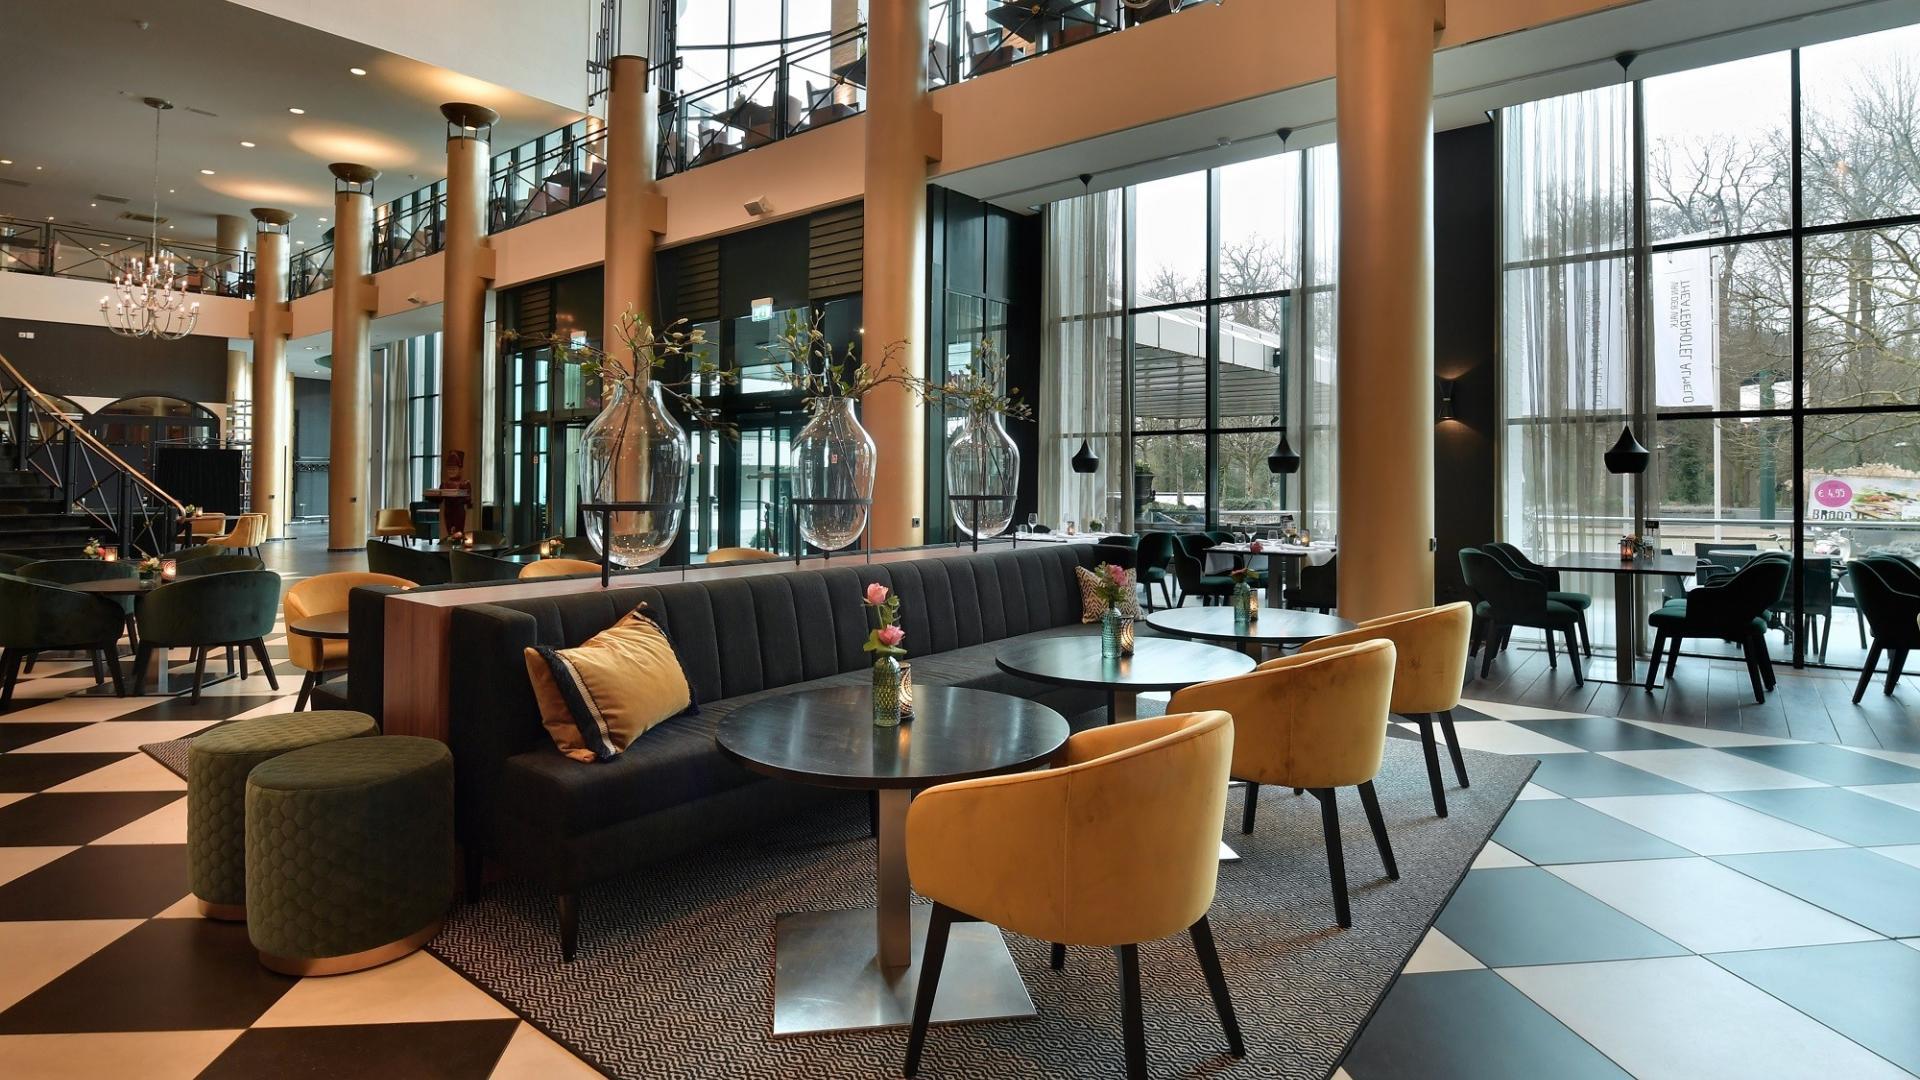 Dagaanbieding - 3 dagen Twente in luxe 4*-Van der Valk hotel in Almelo incl. ontbijt dagelijkse koopjes